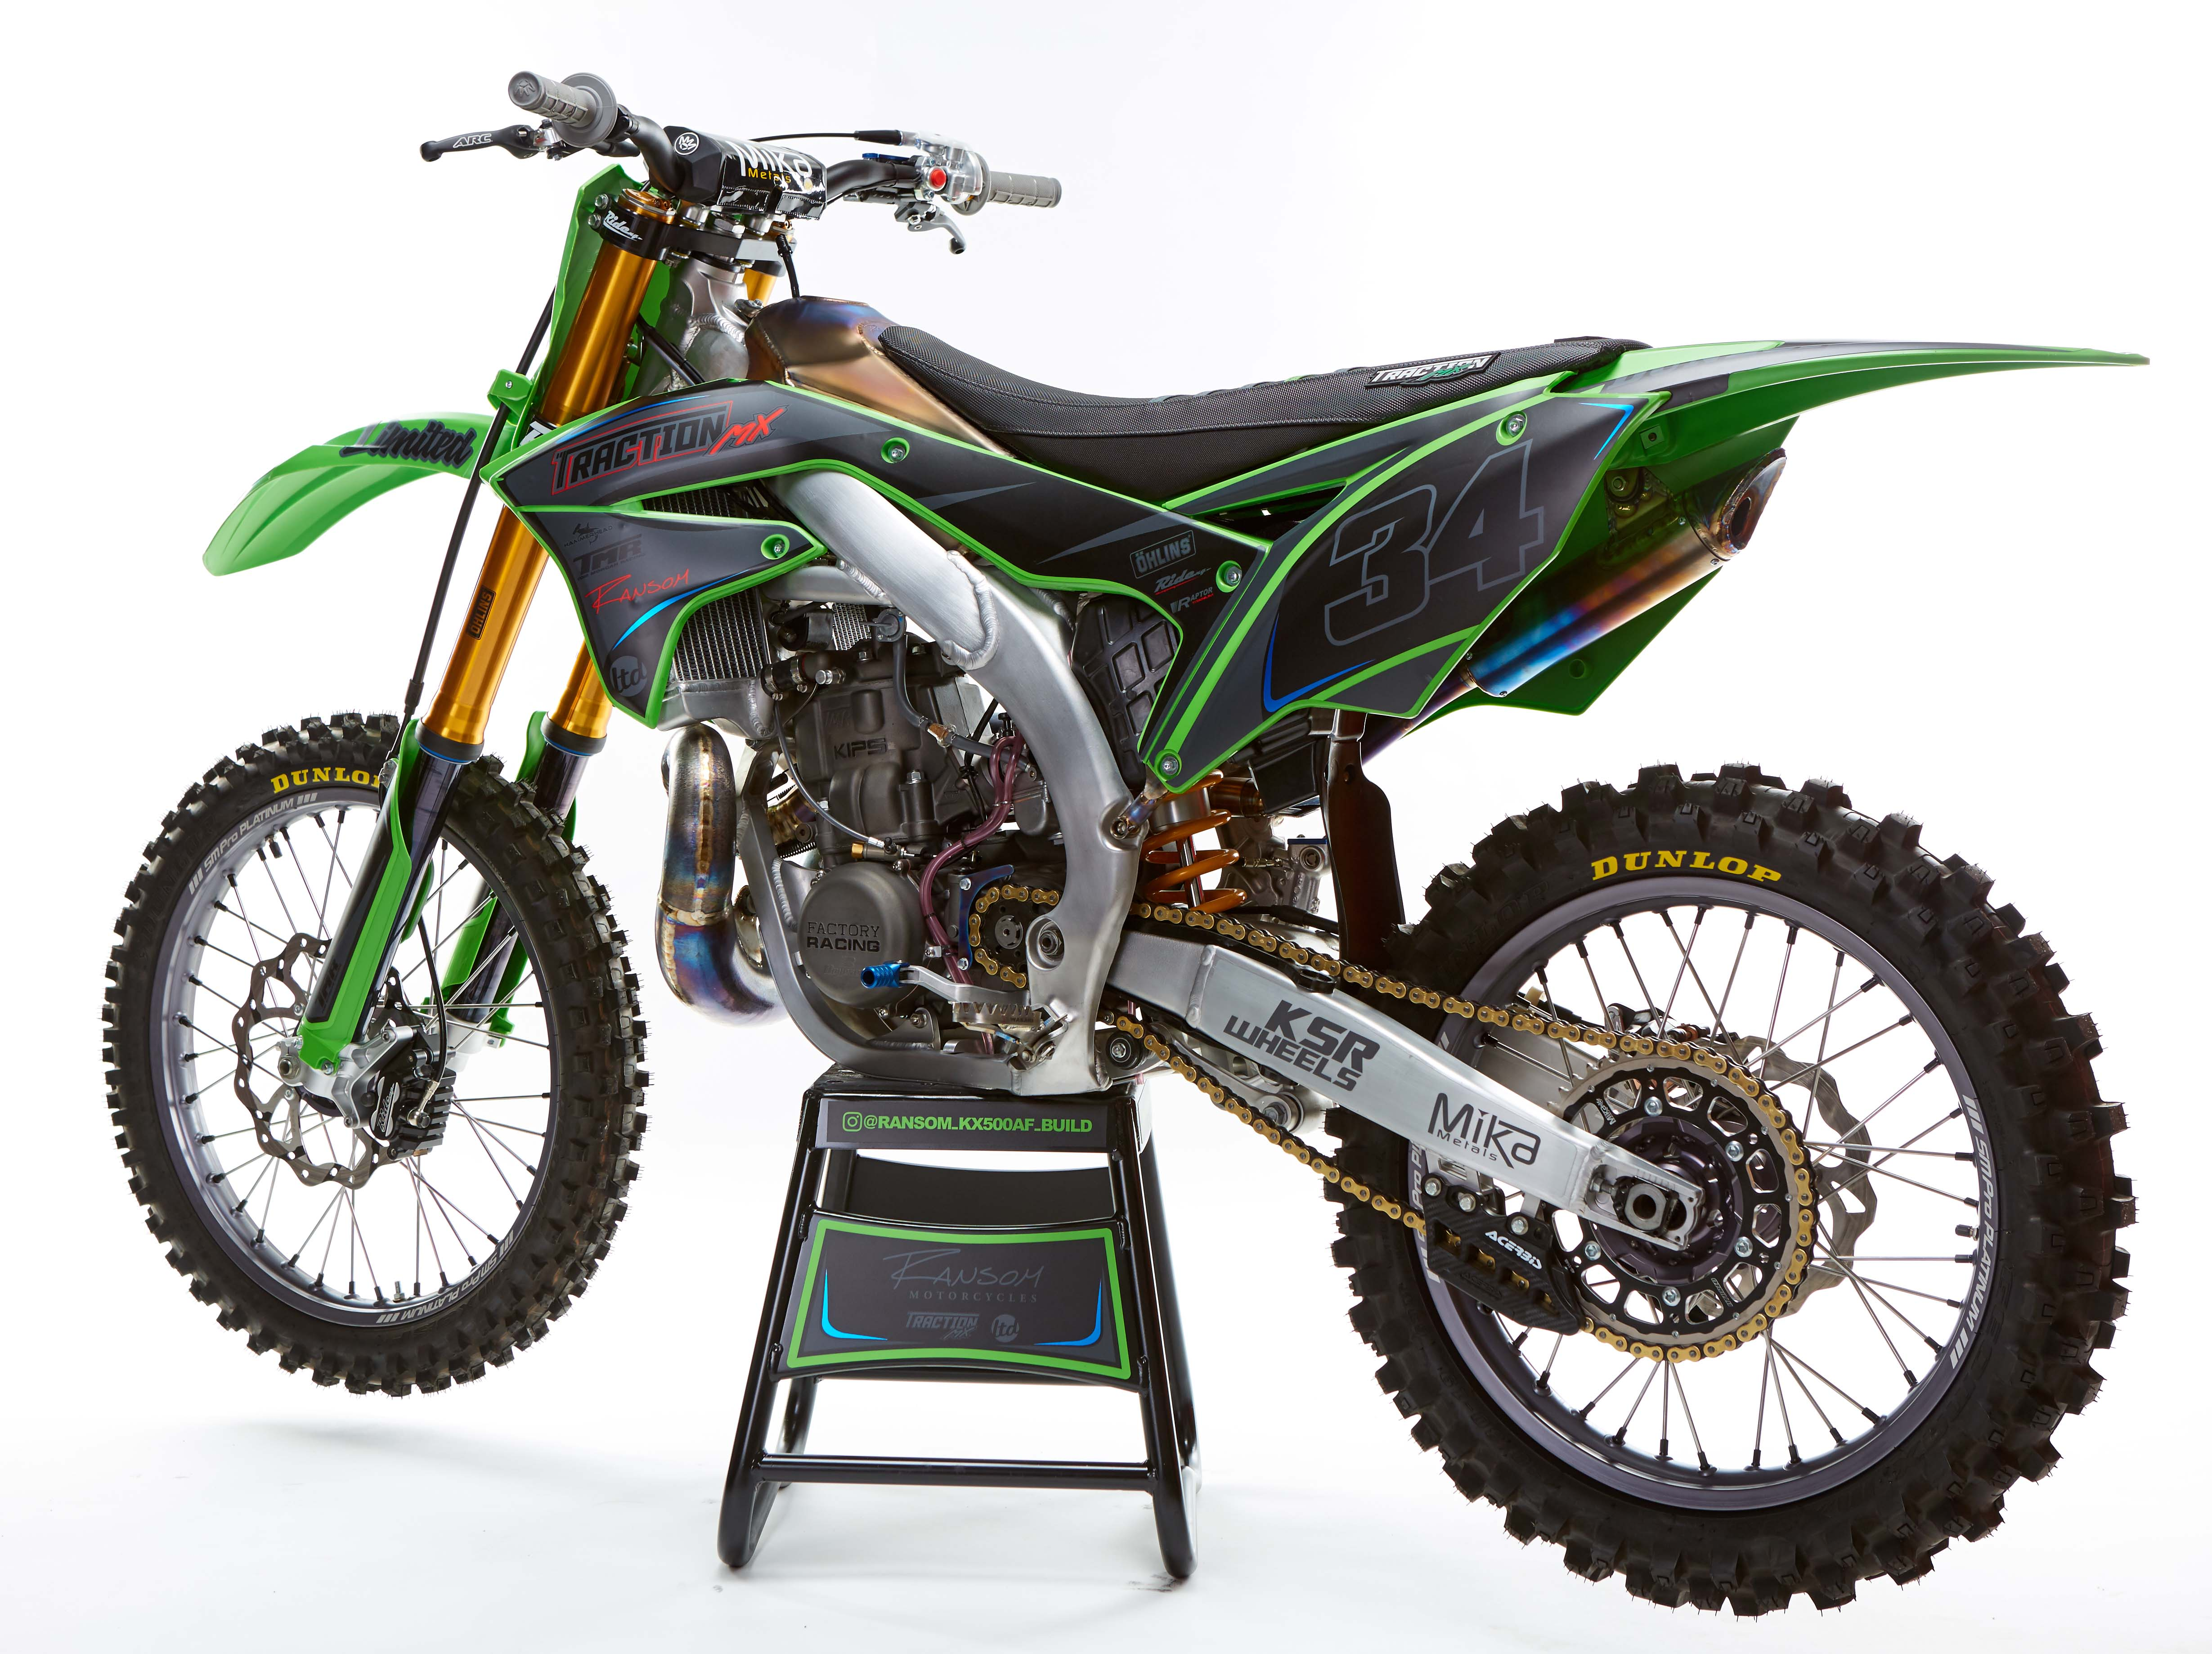 Work of Art: Ransom Kawasaki KX500 Aluminum Frame Bike Build